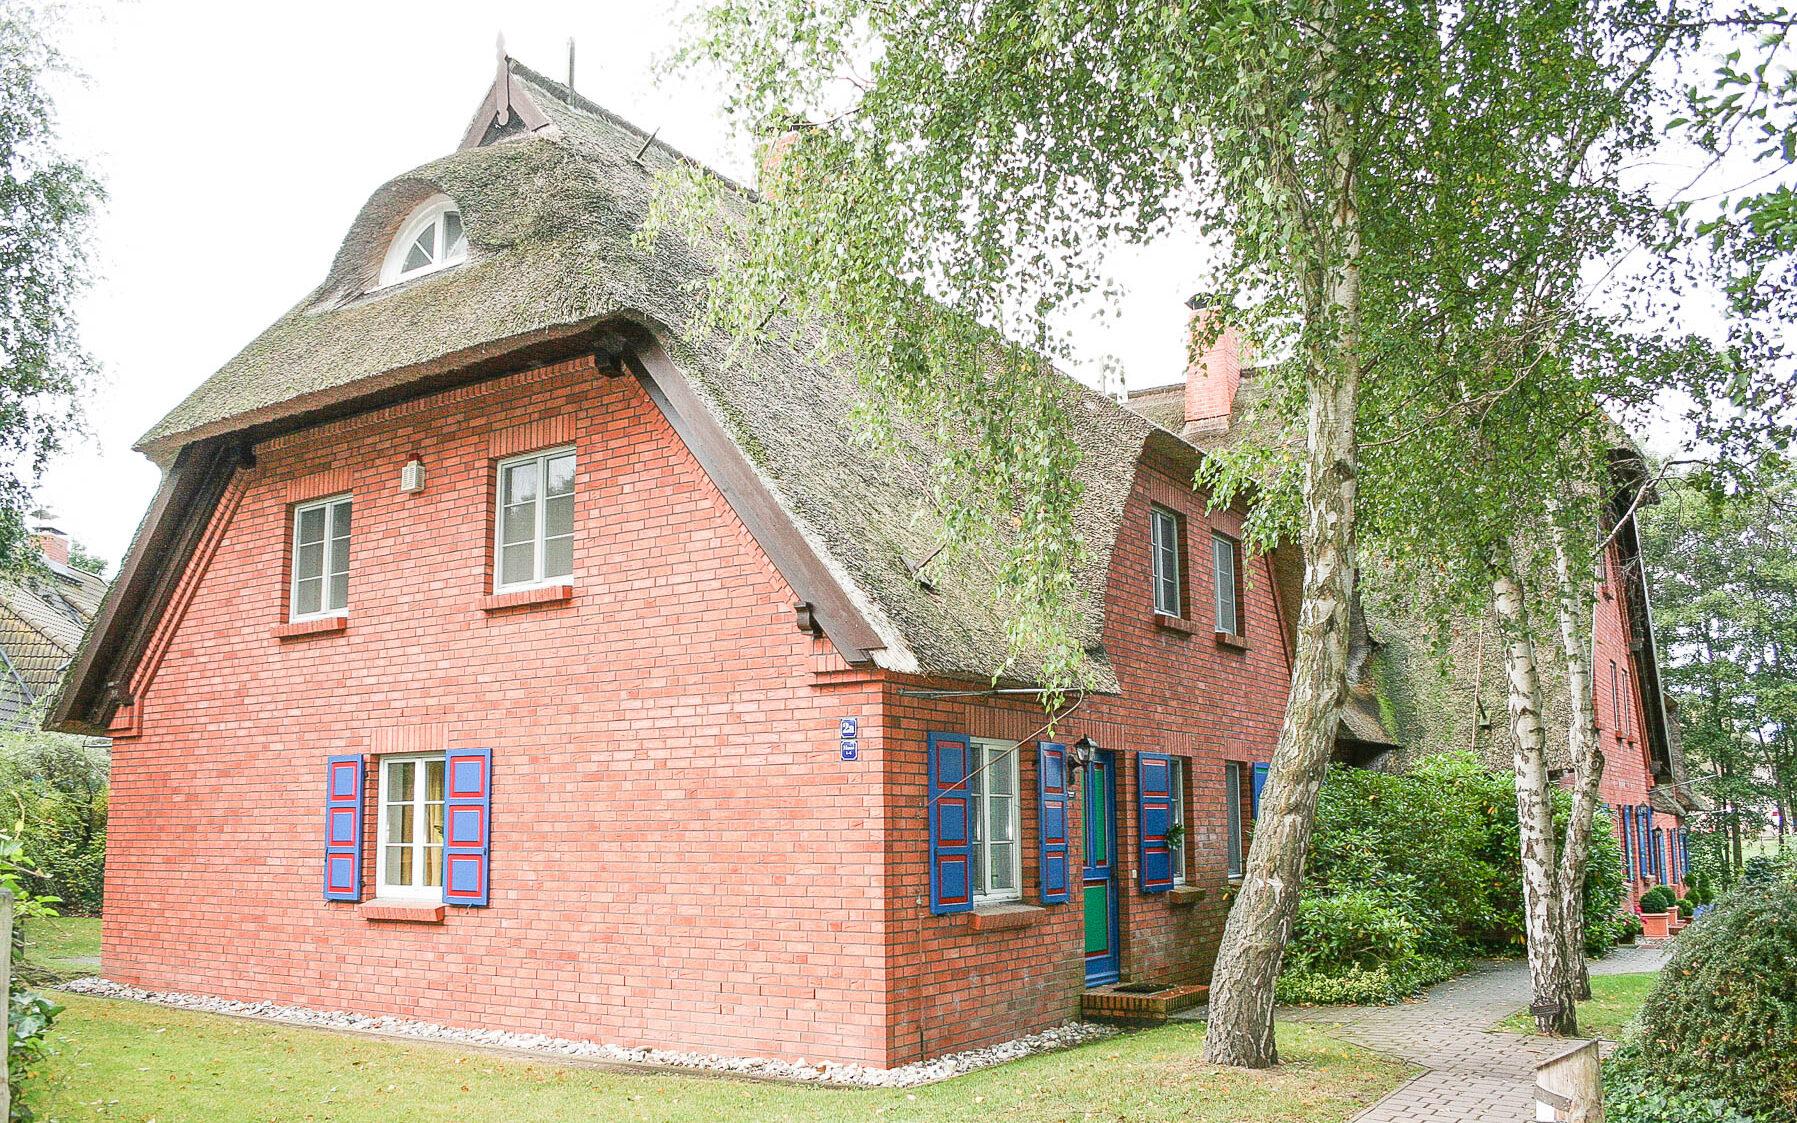 Eigentumswohnung-Ahrenshoop-2